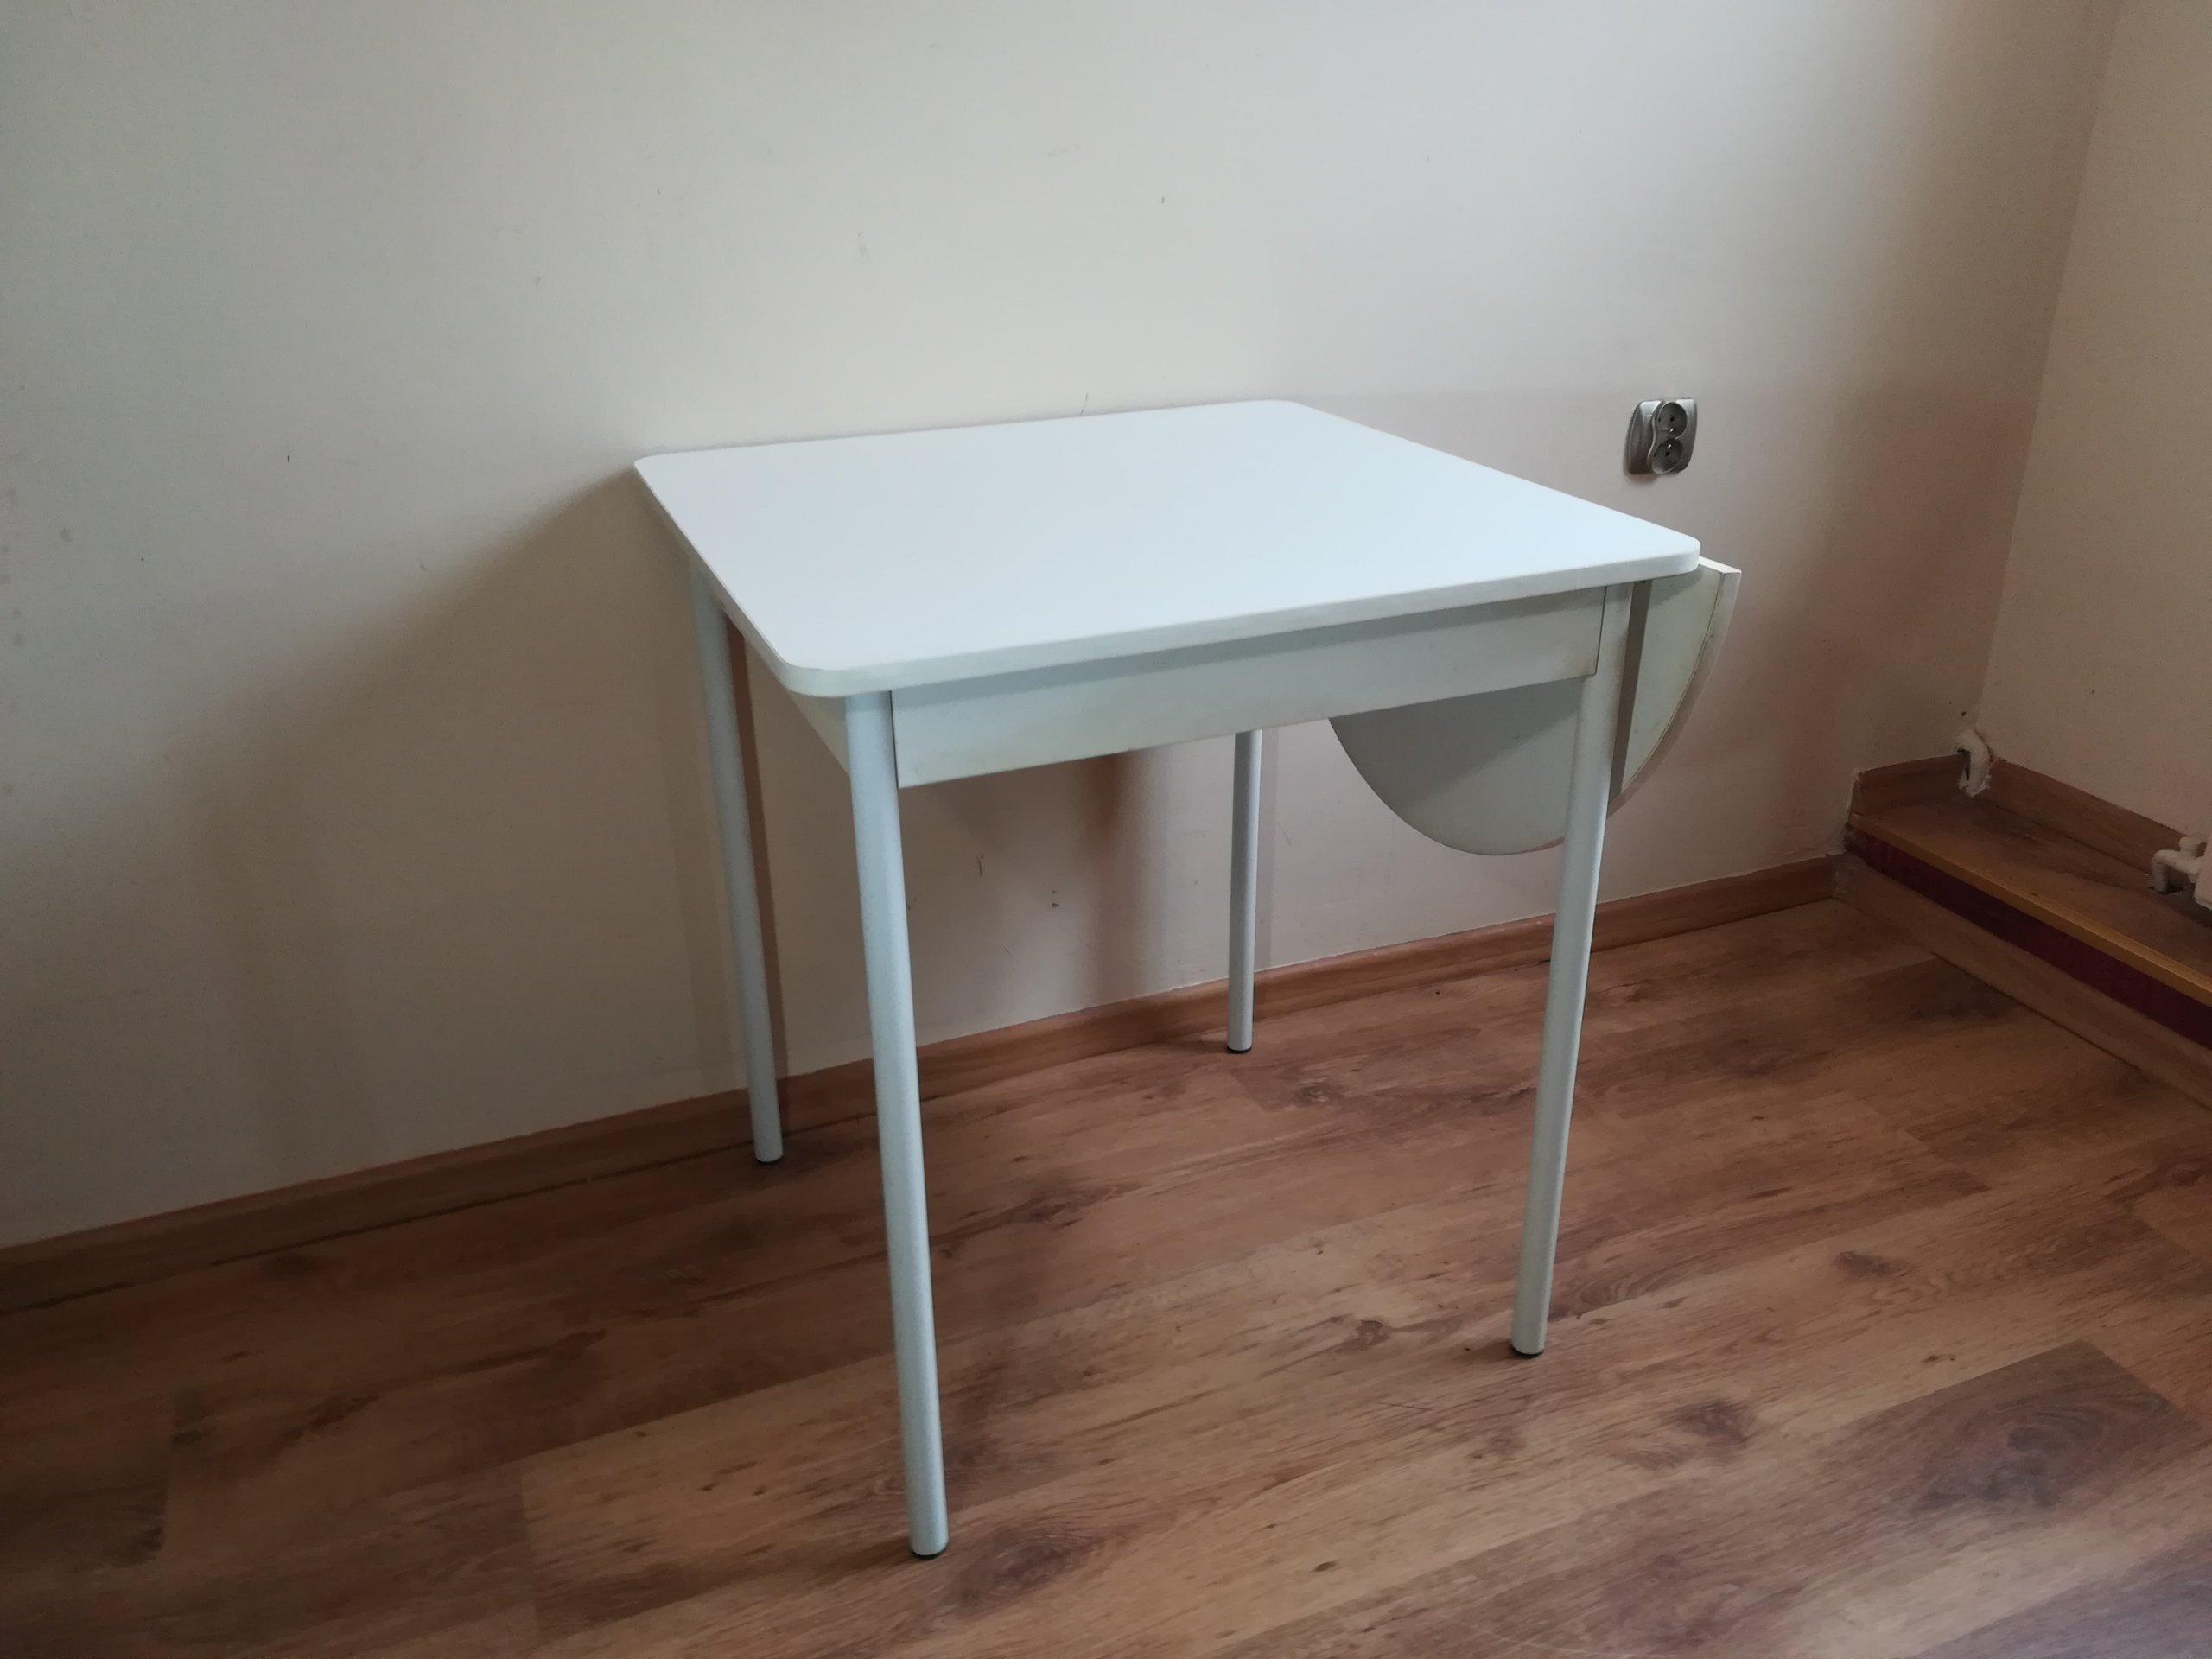 Stół Stolik Rozkładany Do Kuchni Kuchenny Retro 7185165672